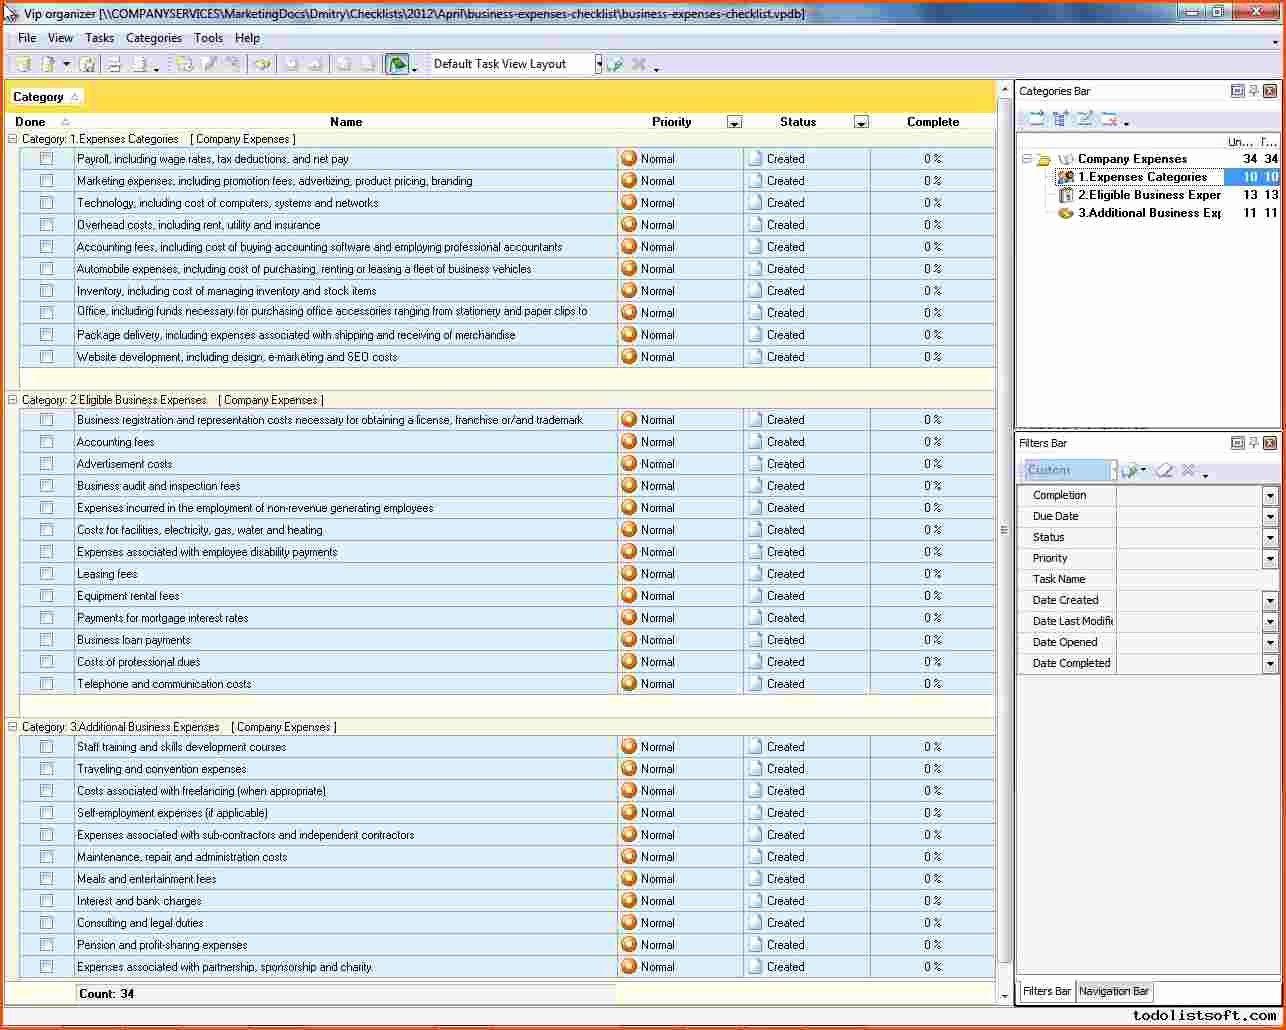 Schedule C Excel Template Lovely Schedule C Expense Excel Template – Printable Schedule